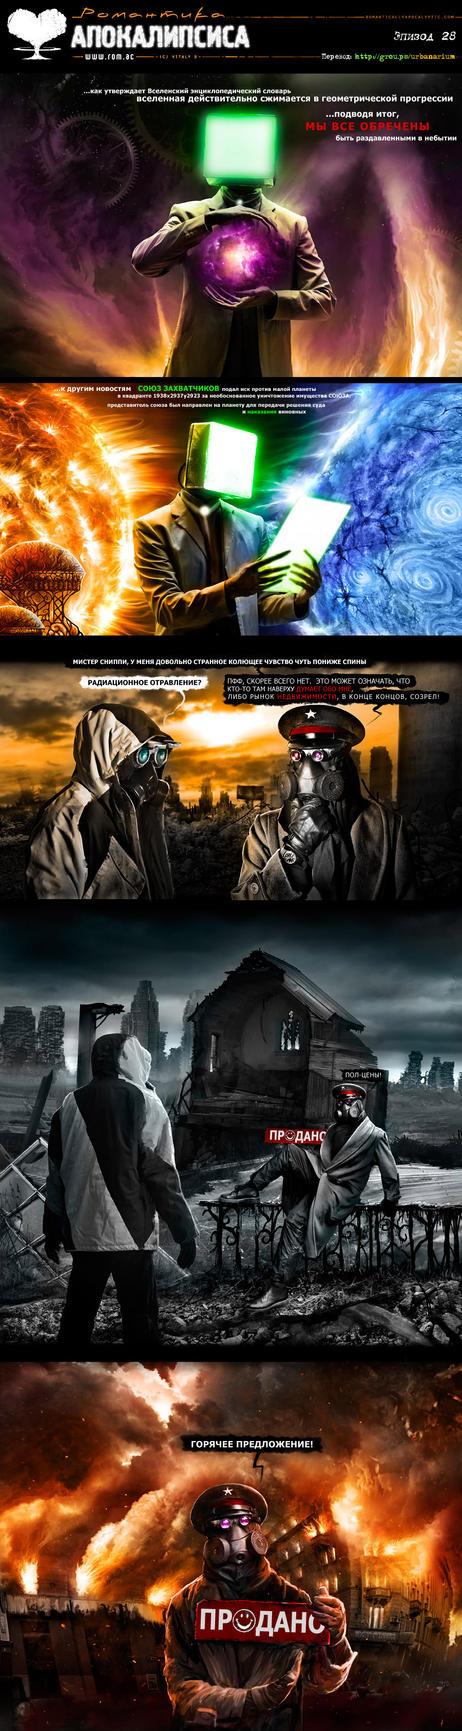 Romantically Apocalyptic 28 by Urbanarium